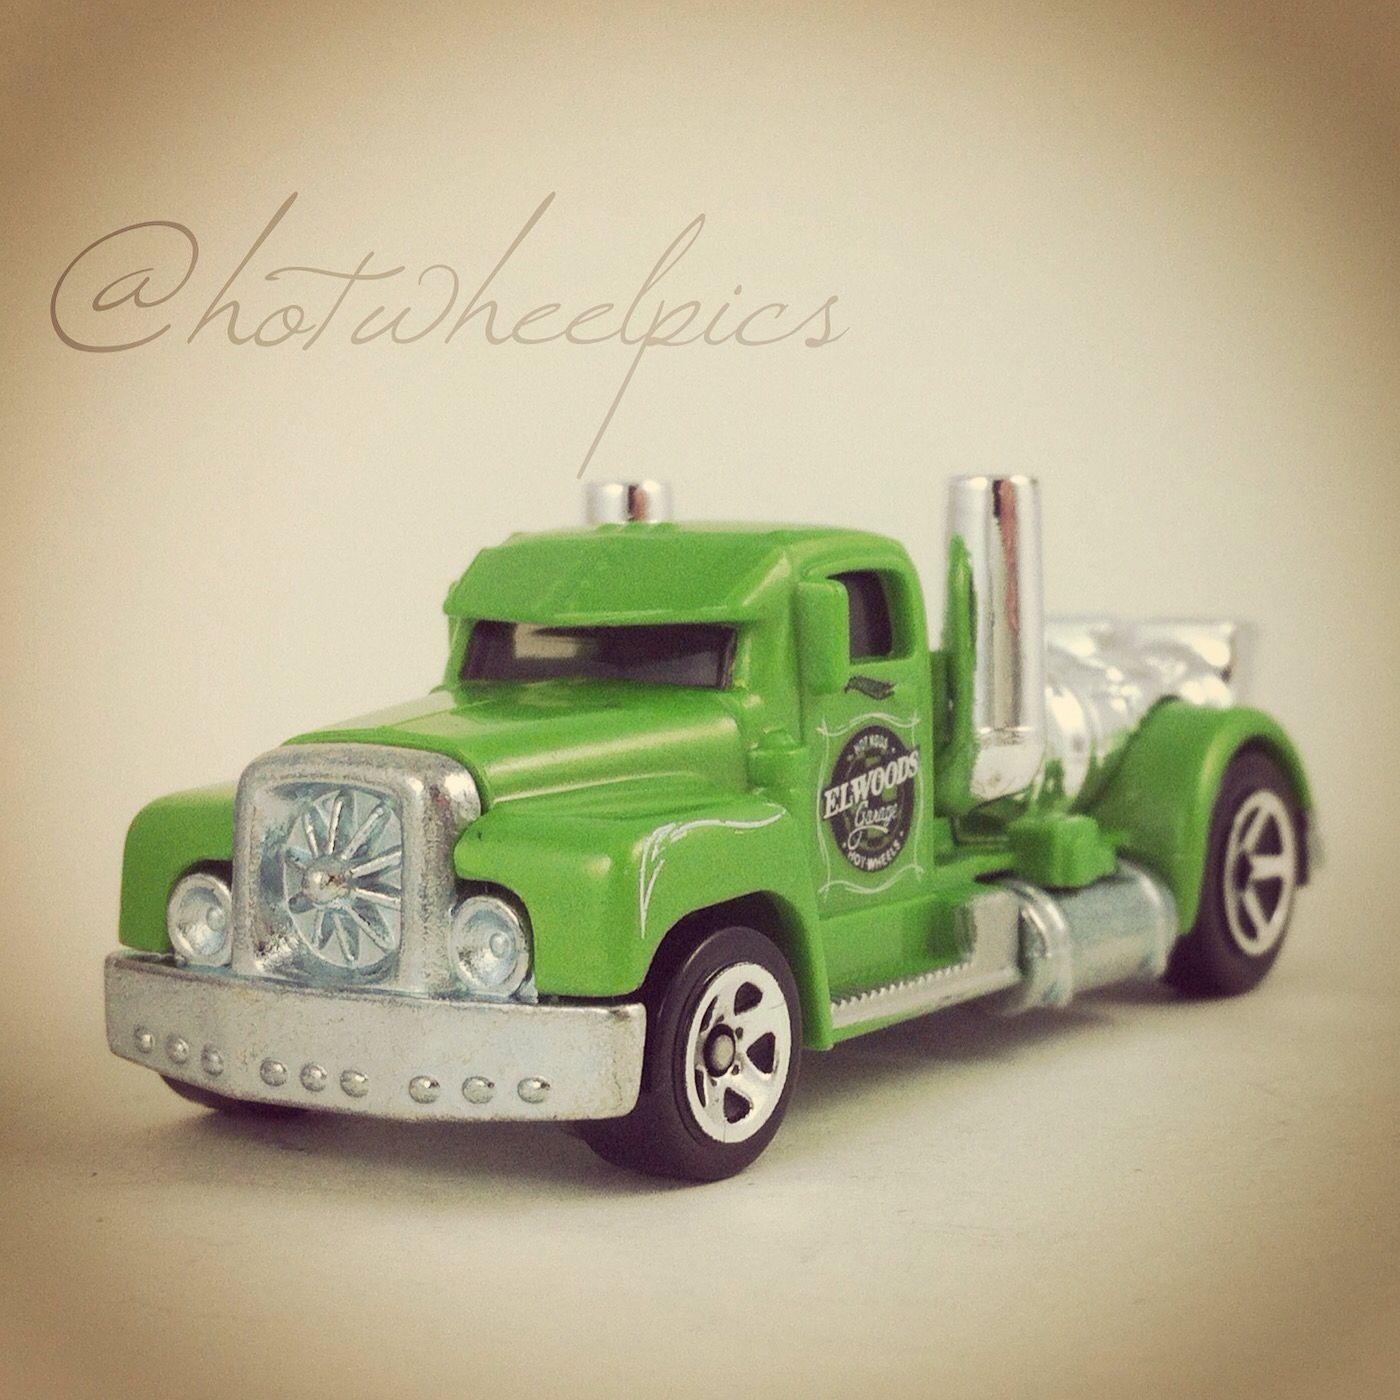 Turbine Time - 2015 Hot Wheels - HW City - Works  #hotwheels | #diecast | #toys | #hwp2015ml